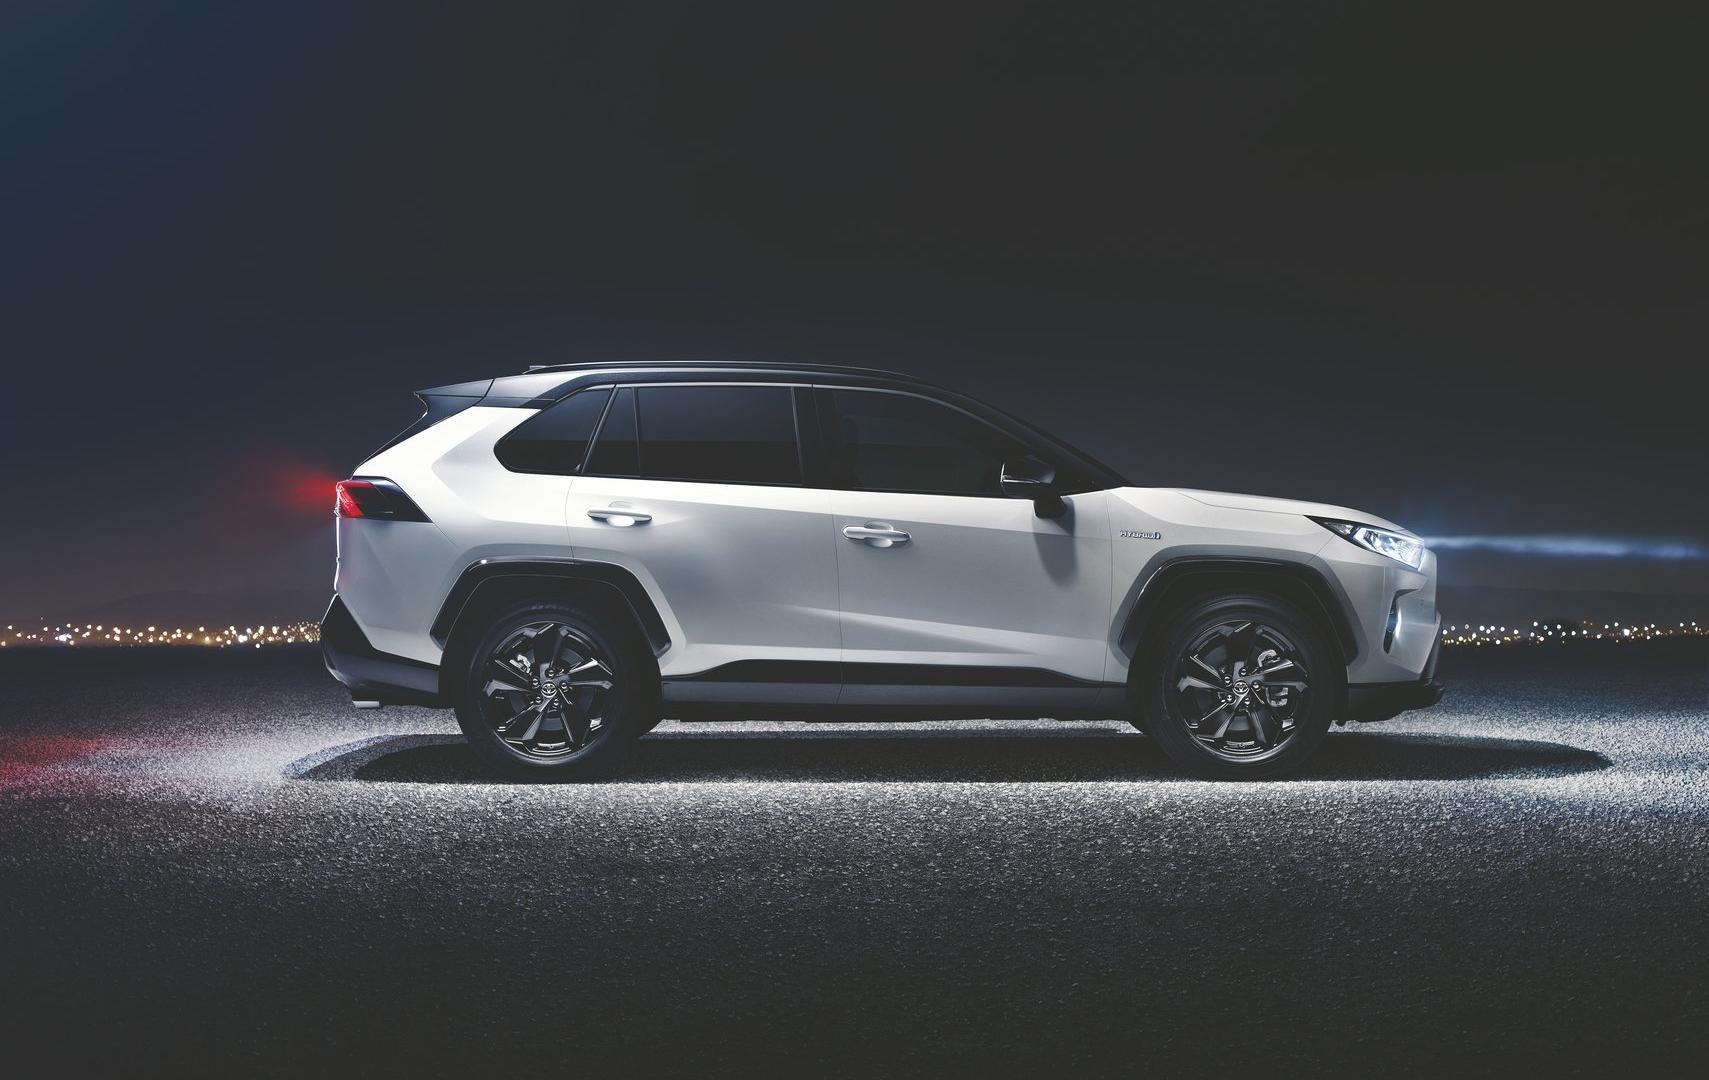 Toyota Rav4 Hybrid 2018 Galerie Prasowe Galeria